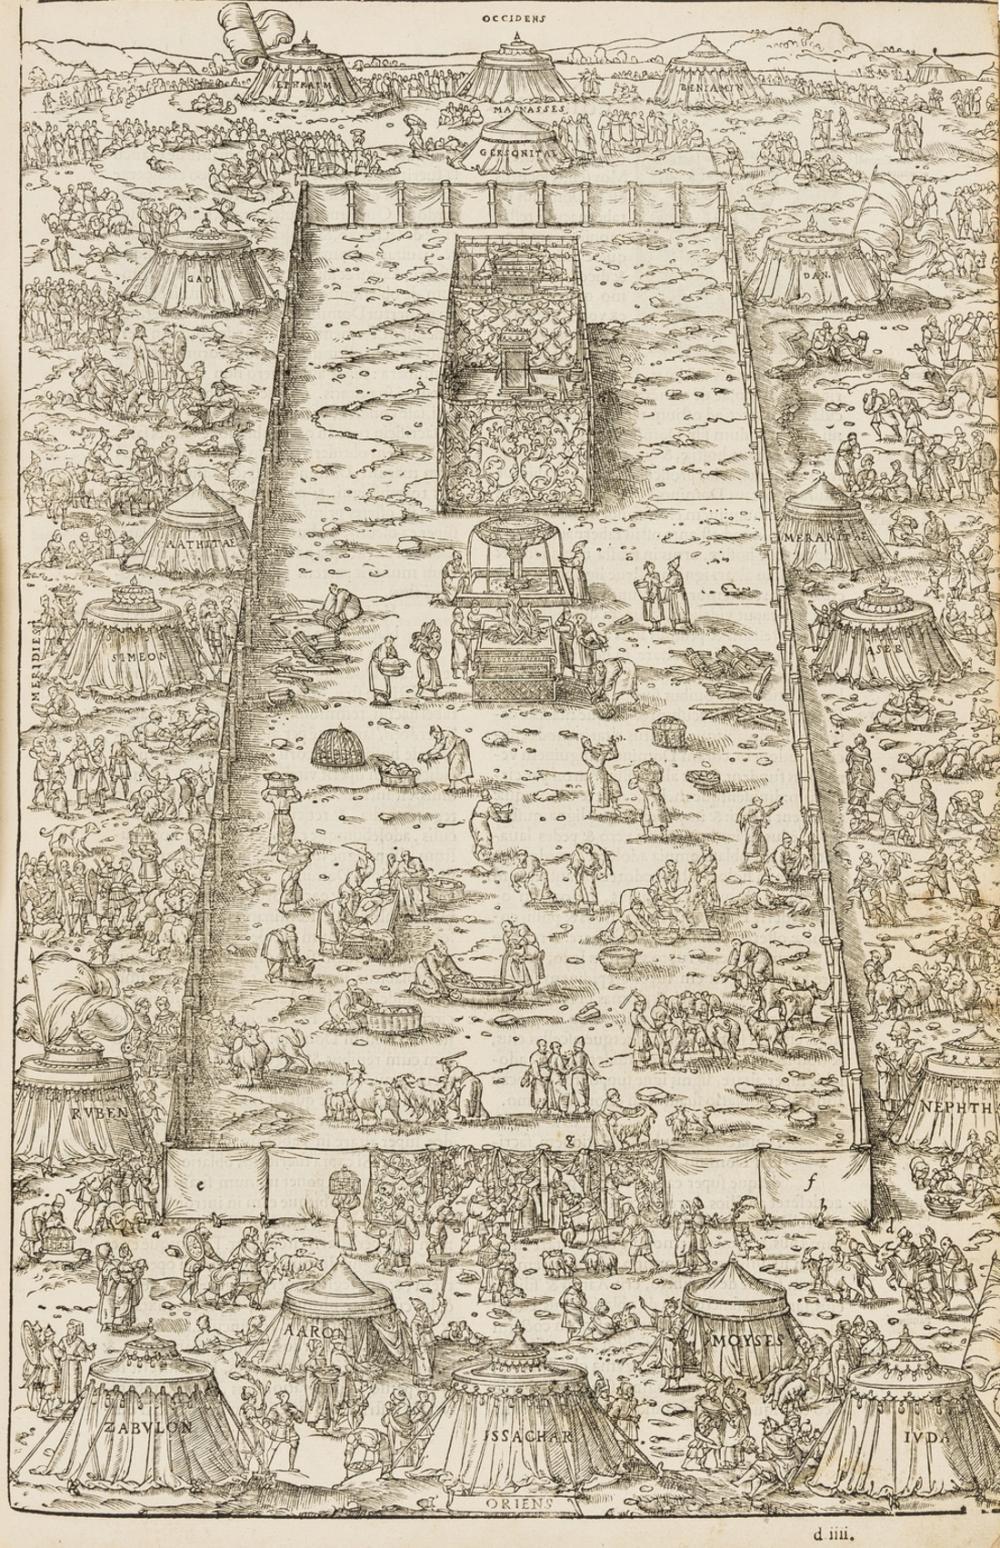 Estienne.- Bible (Latin) Biblia, Paris, Robert Estienne, 1546.